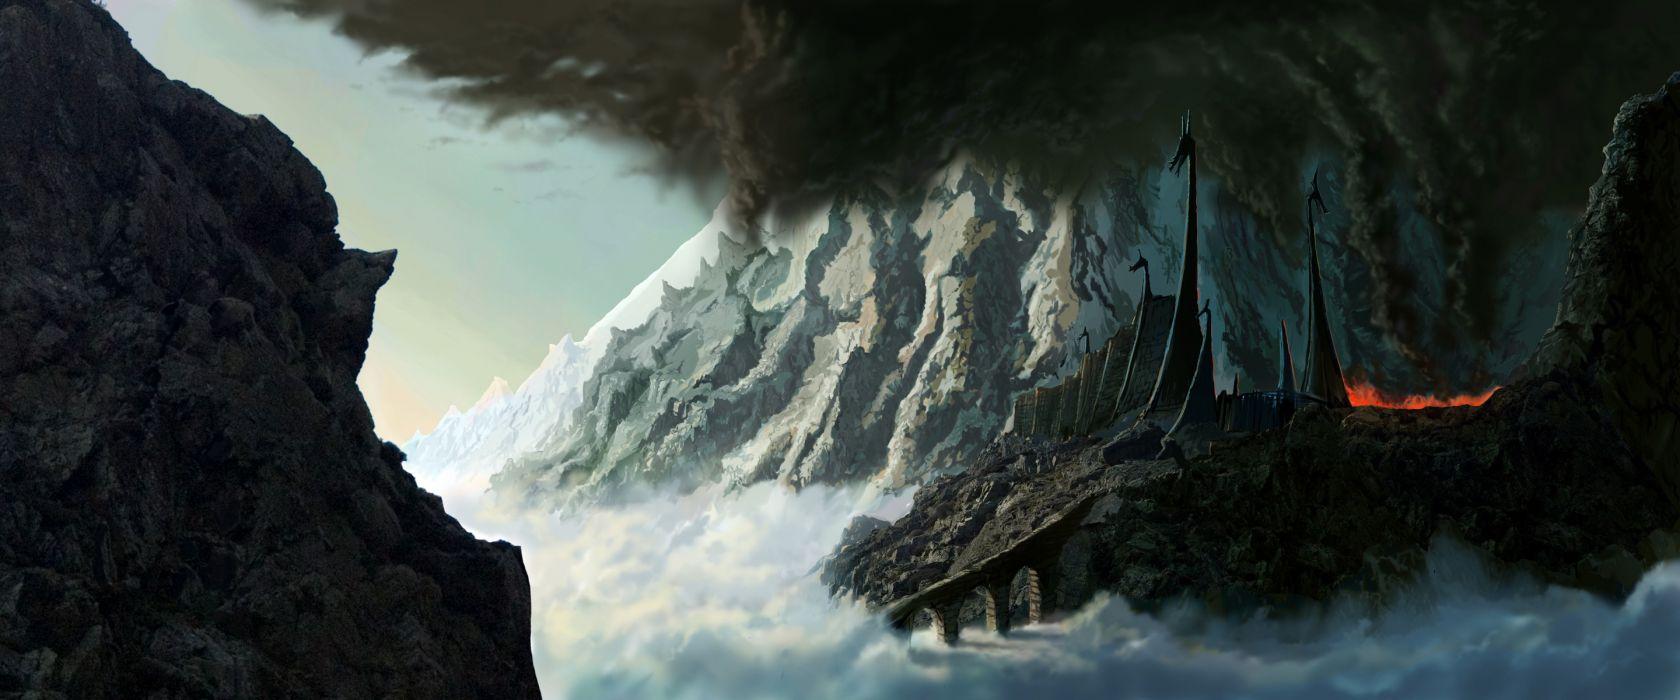 mountains fortress fantasy art Silmarillion JRR Tolkien wallpaper